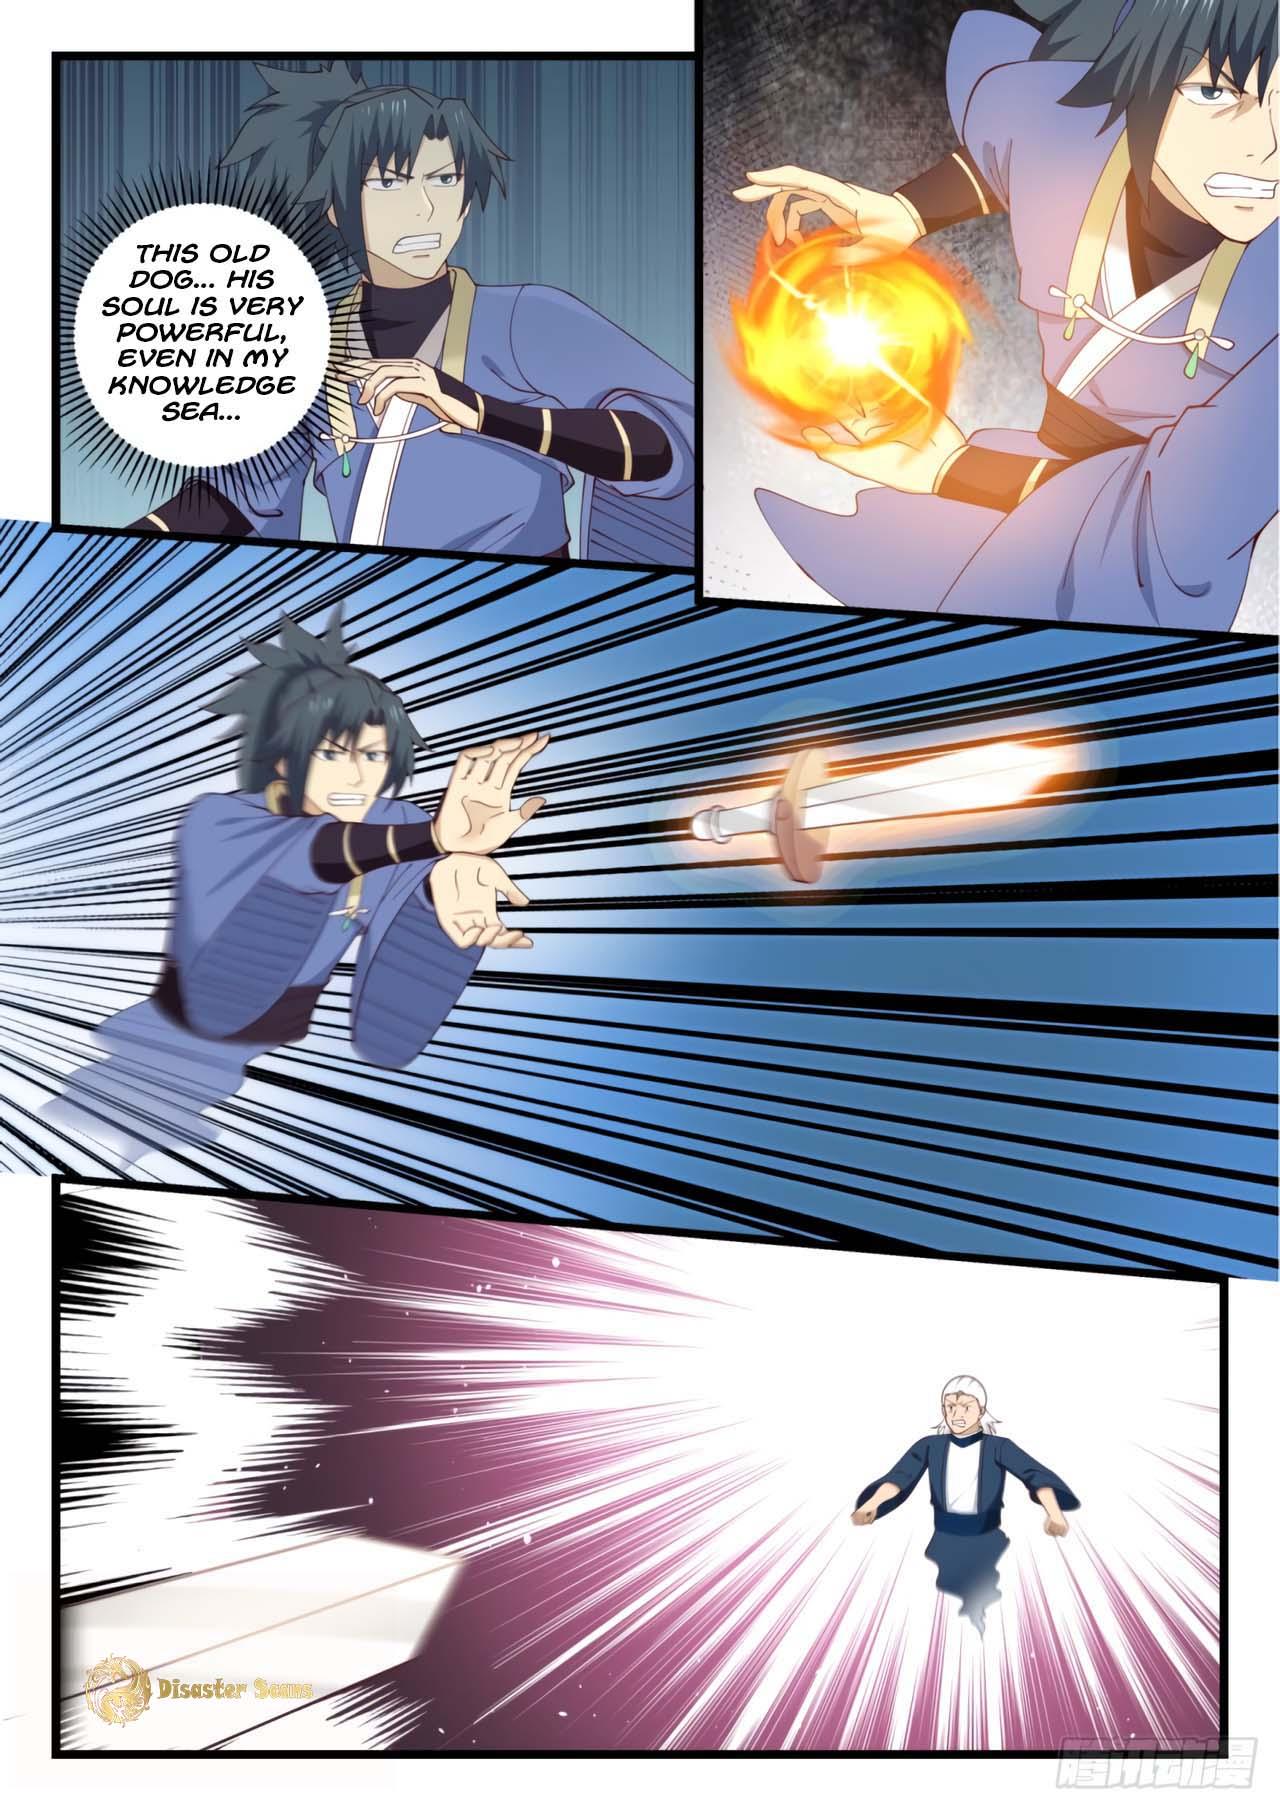 Martial Peak - chapter 510-eng-li